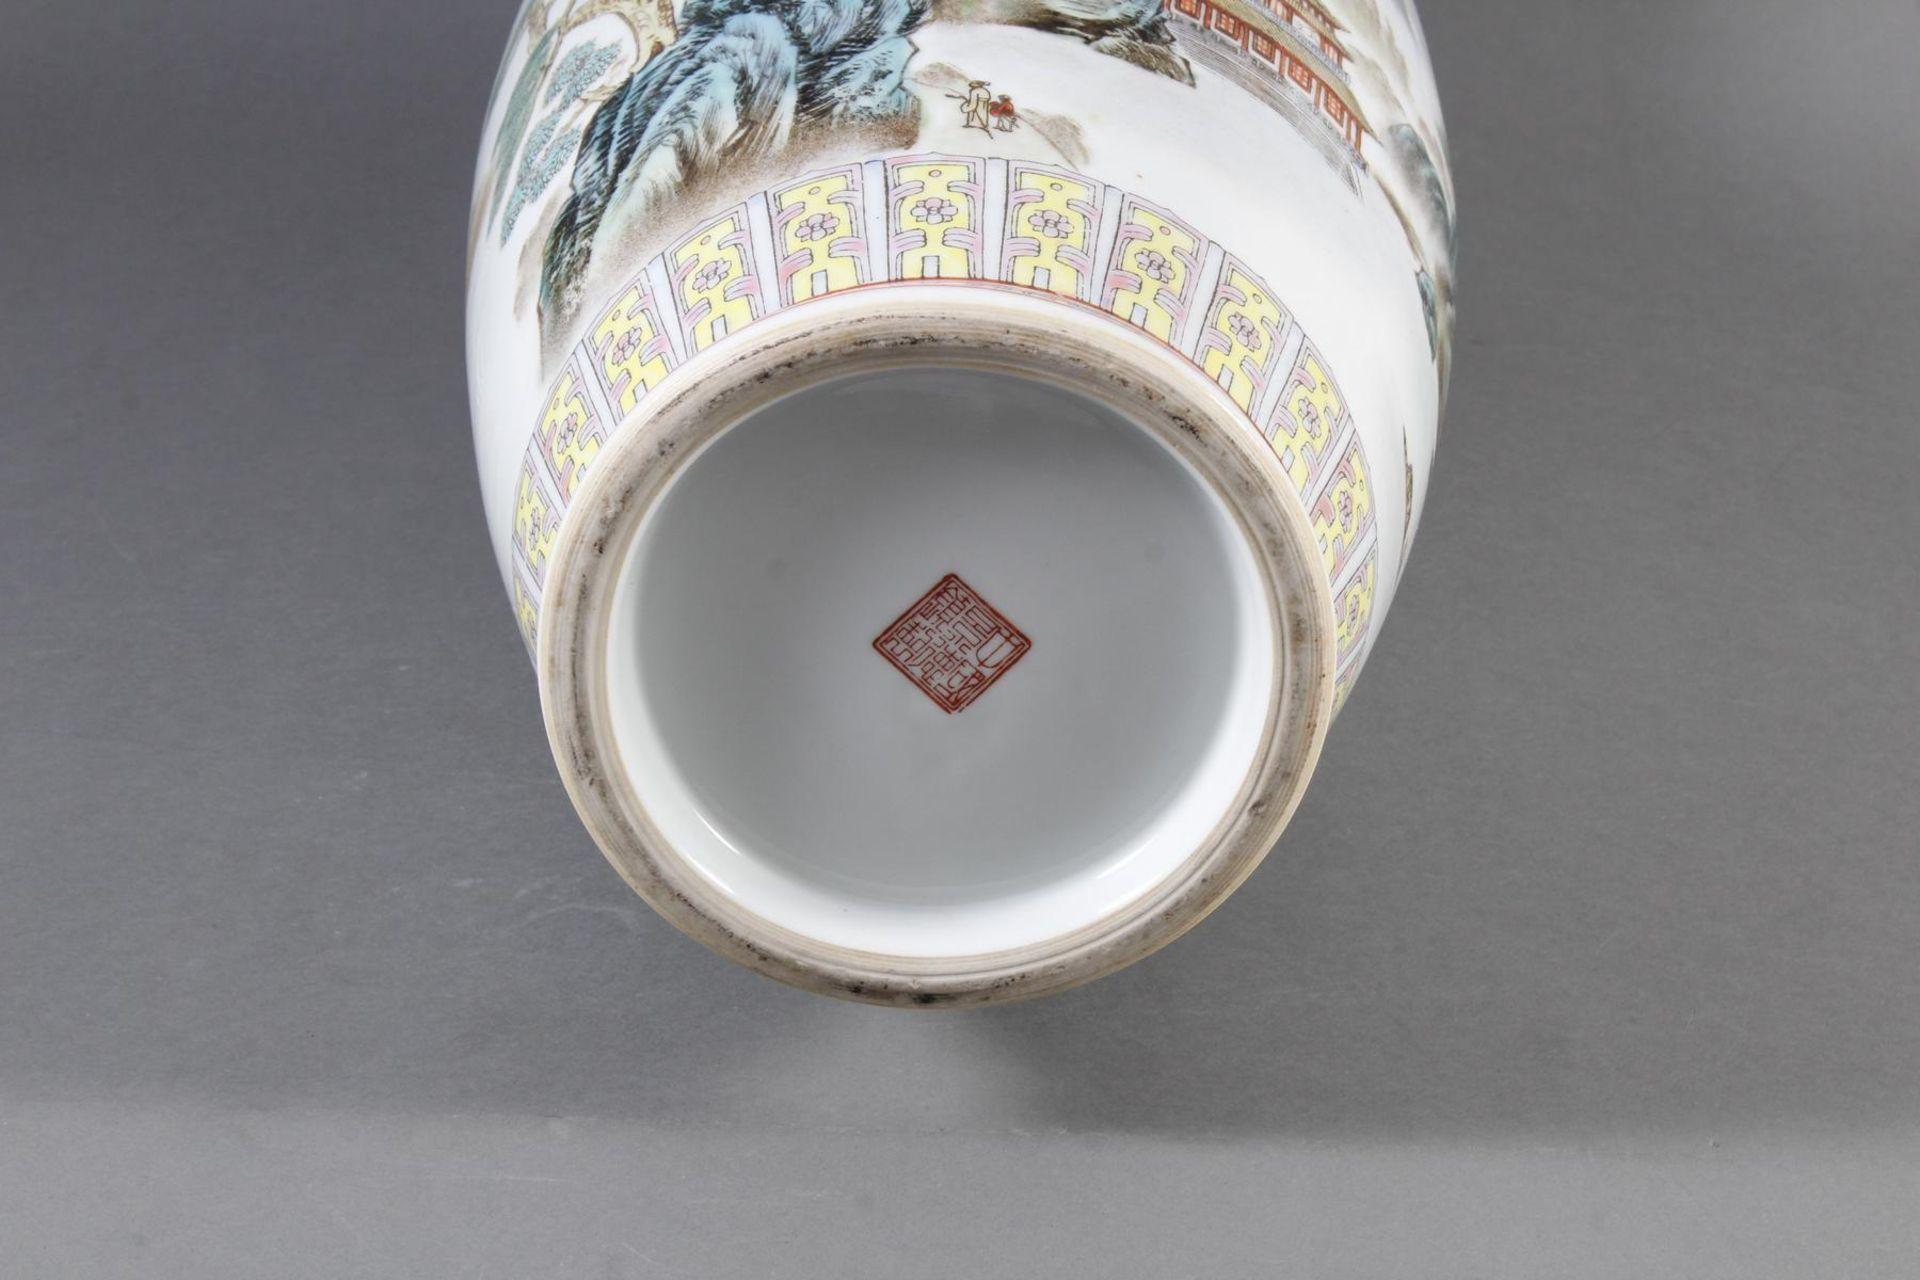 Porzellan Bodenvase, China 20. Jahrhundert - Bild 11 aus 12